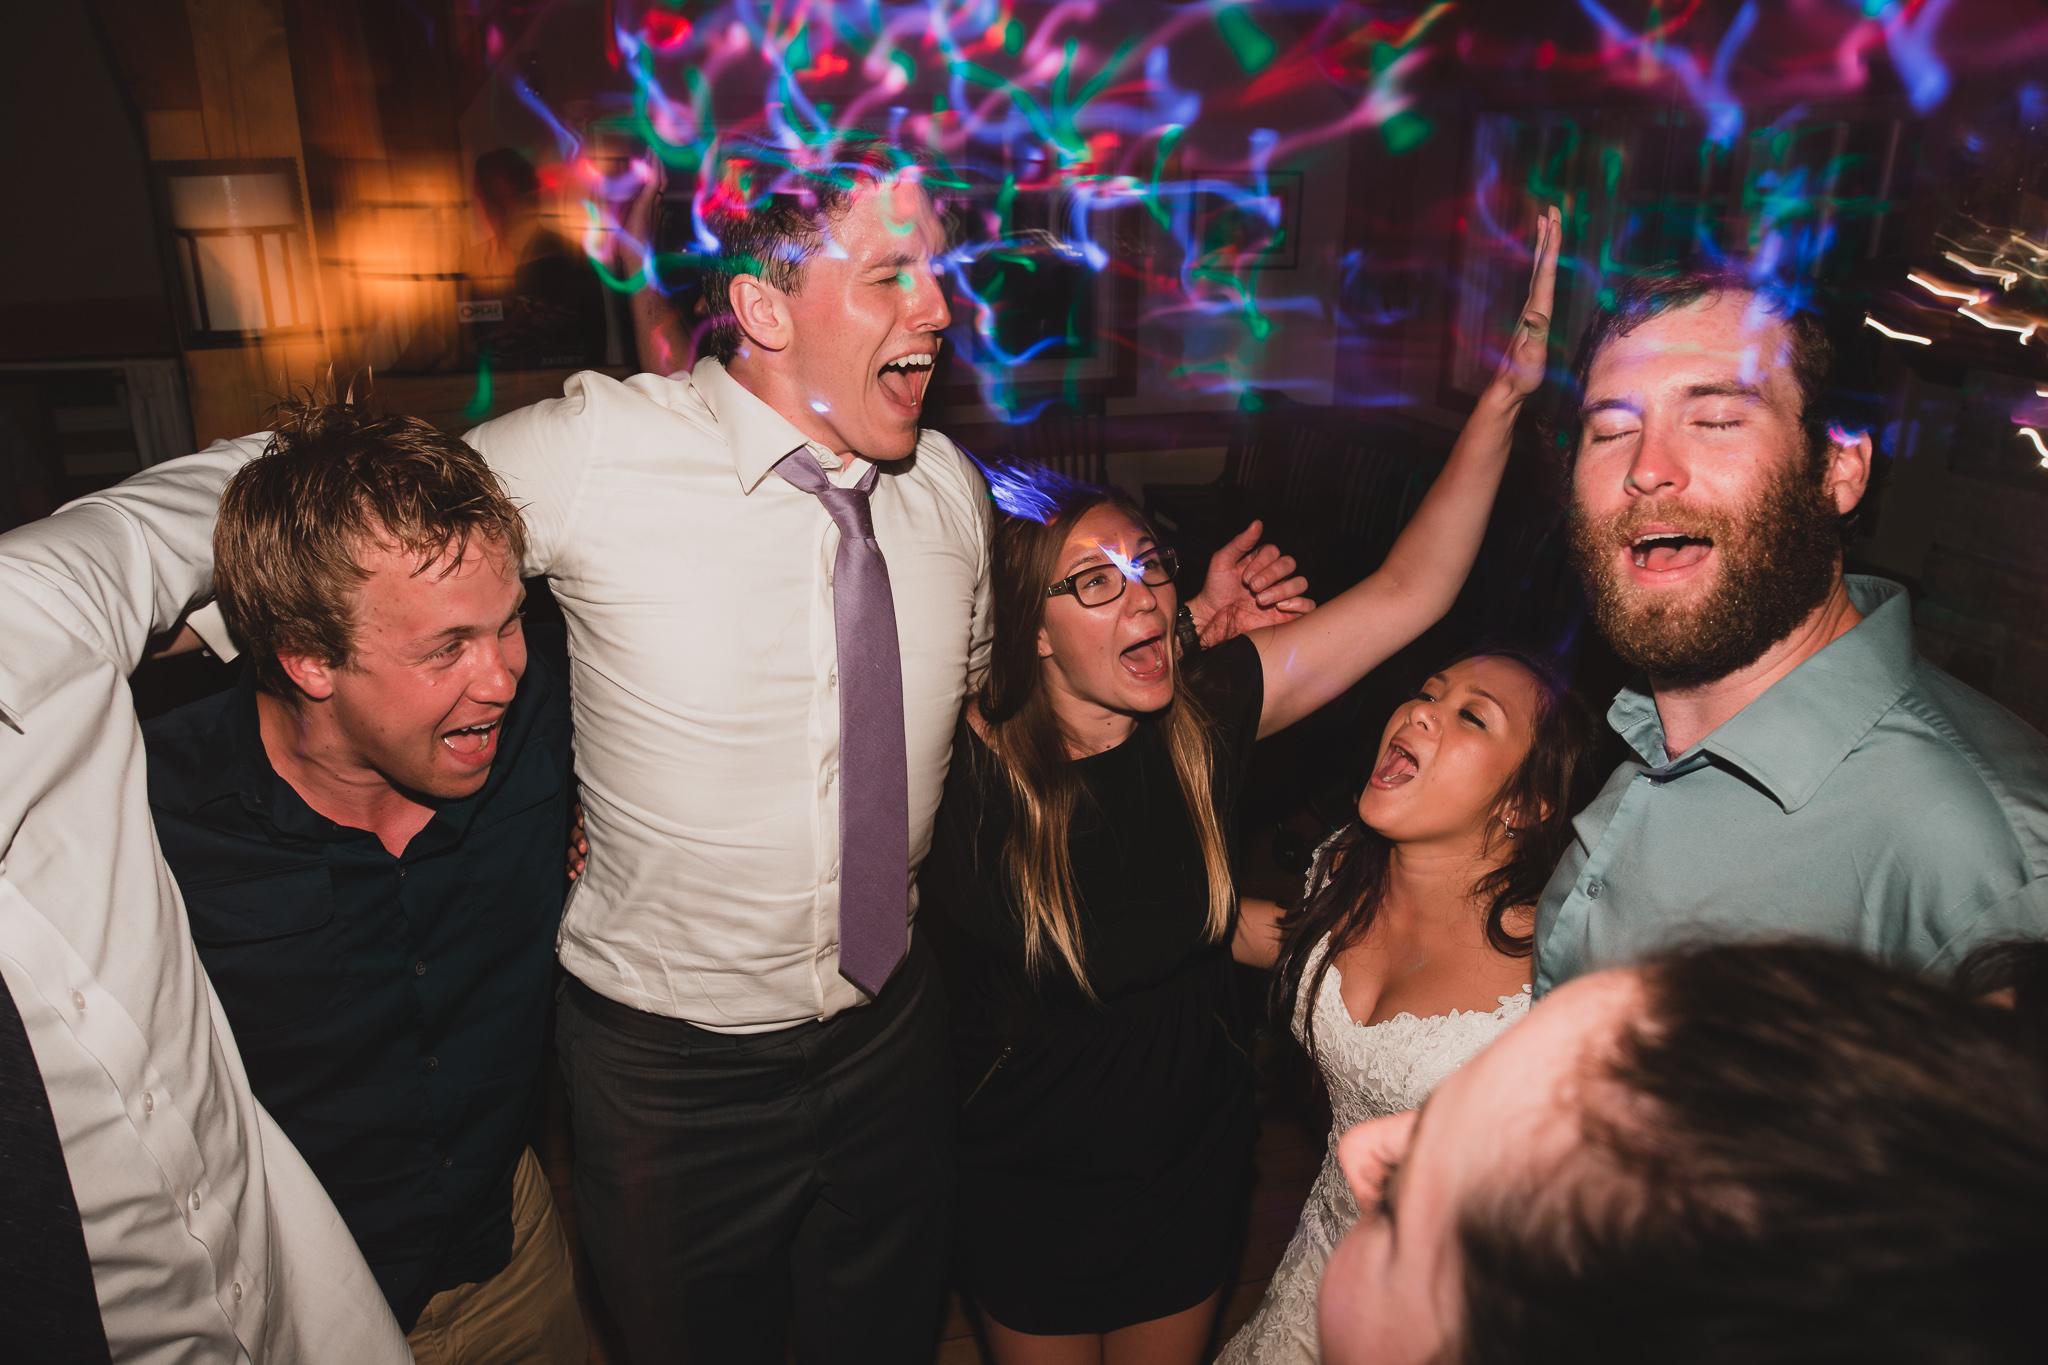 Wedding dancing photos Ottawa